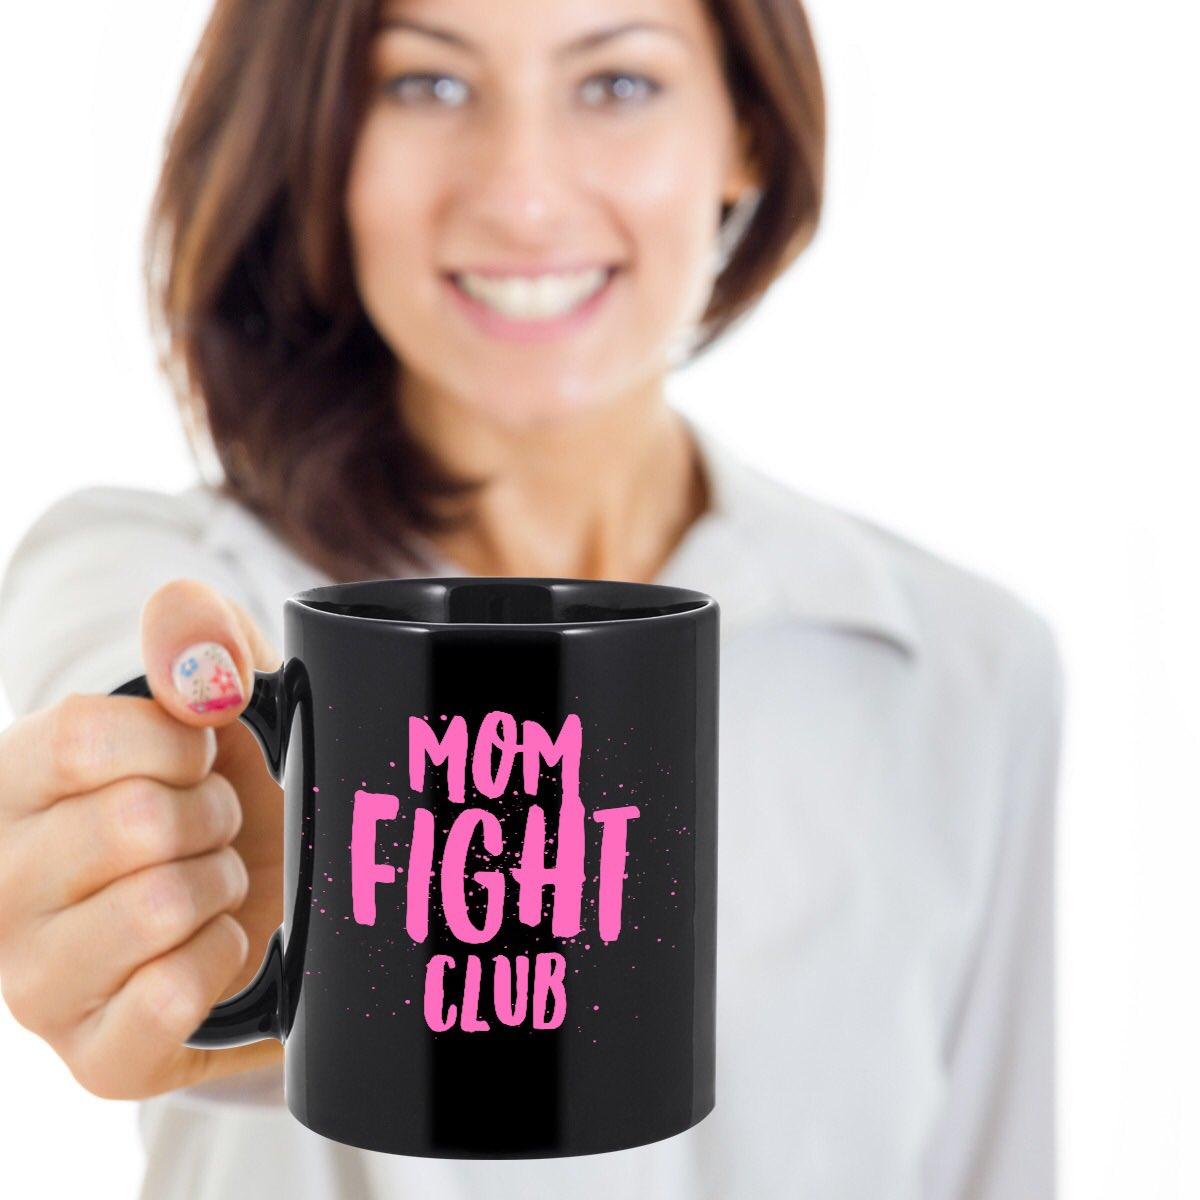 It's time to throw down! #MomFightClub https://t.co/rE1kNjRziD #saturdaymorning https://t.co/LcZuDeUwEY